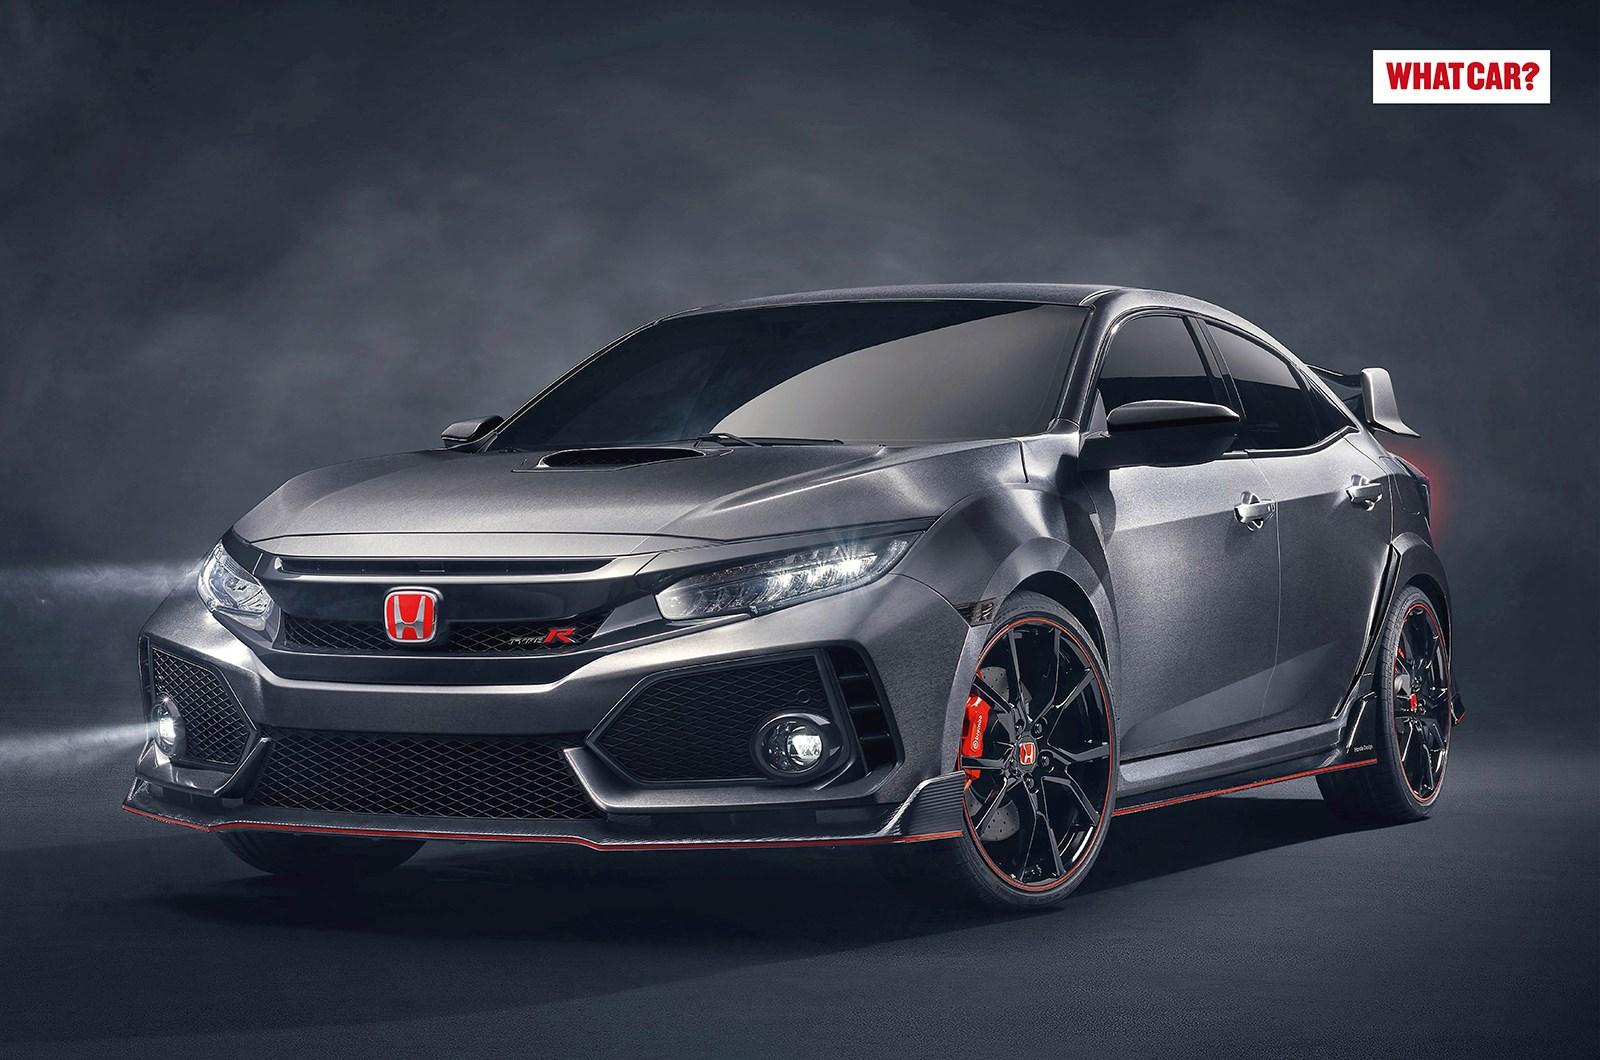 101141 Honda Civic Type R Wins What Car Reader Award